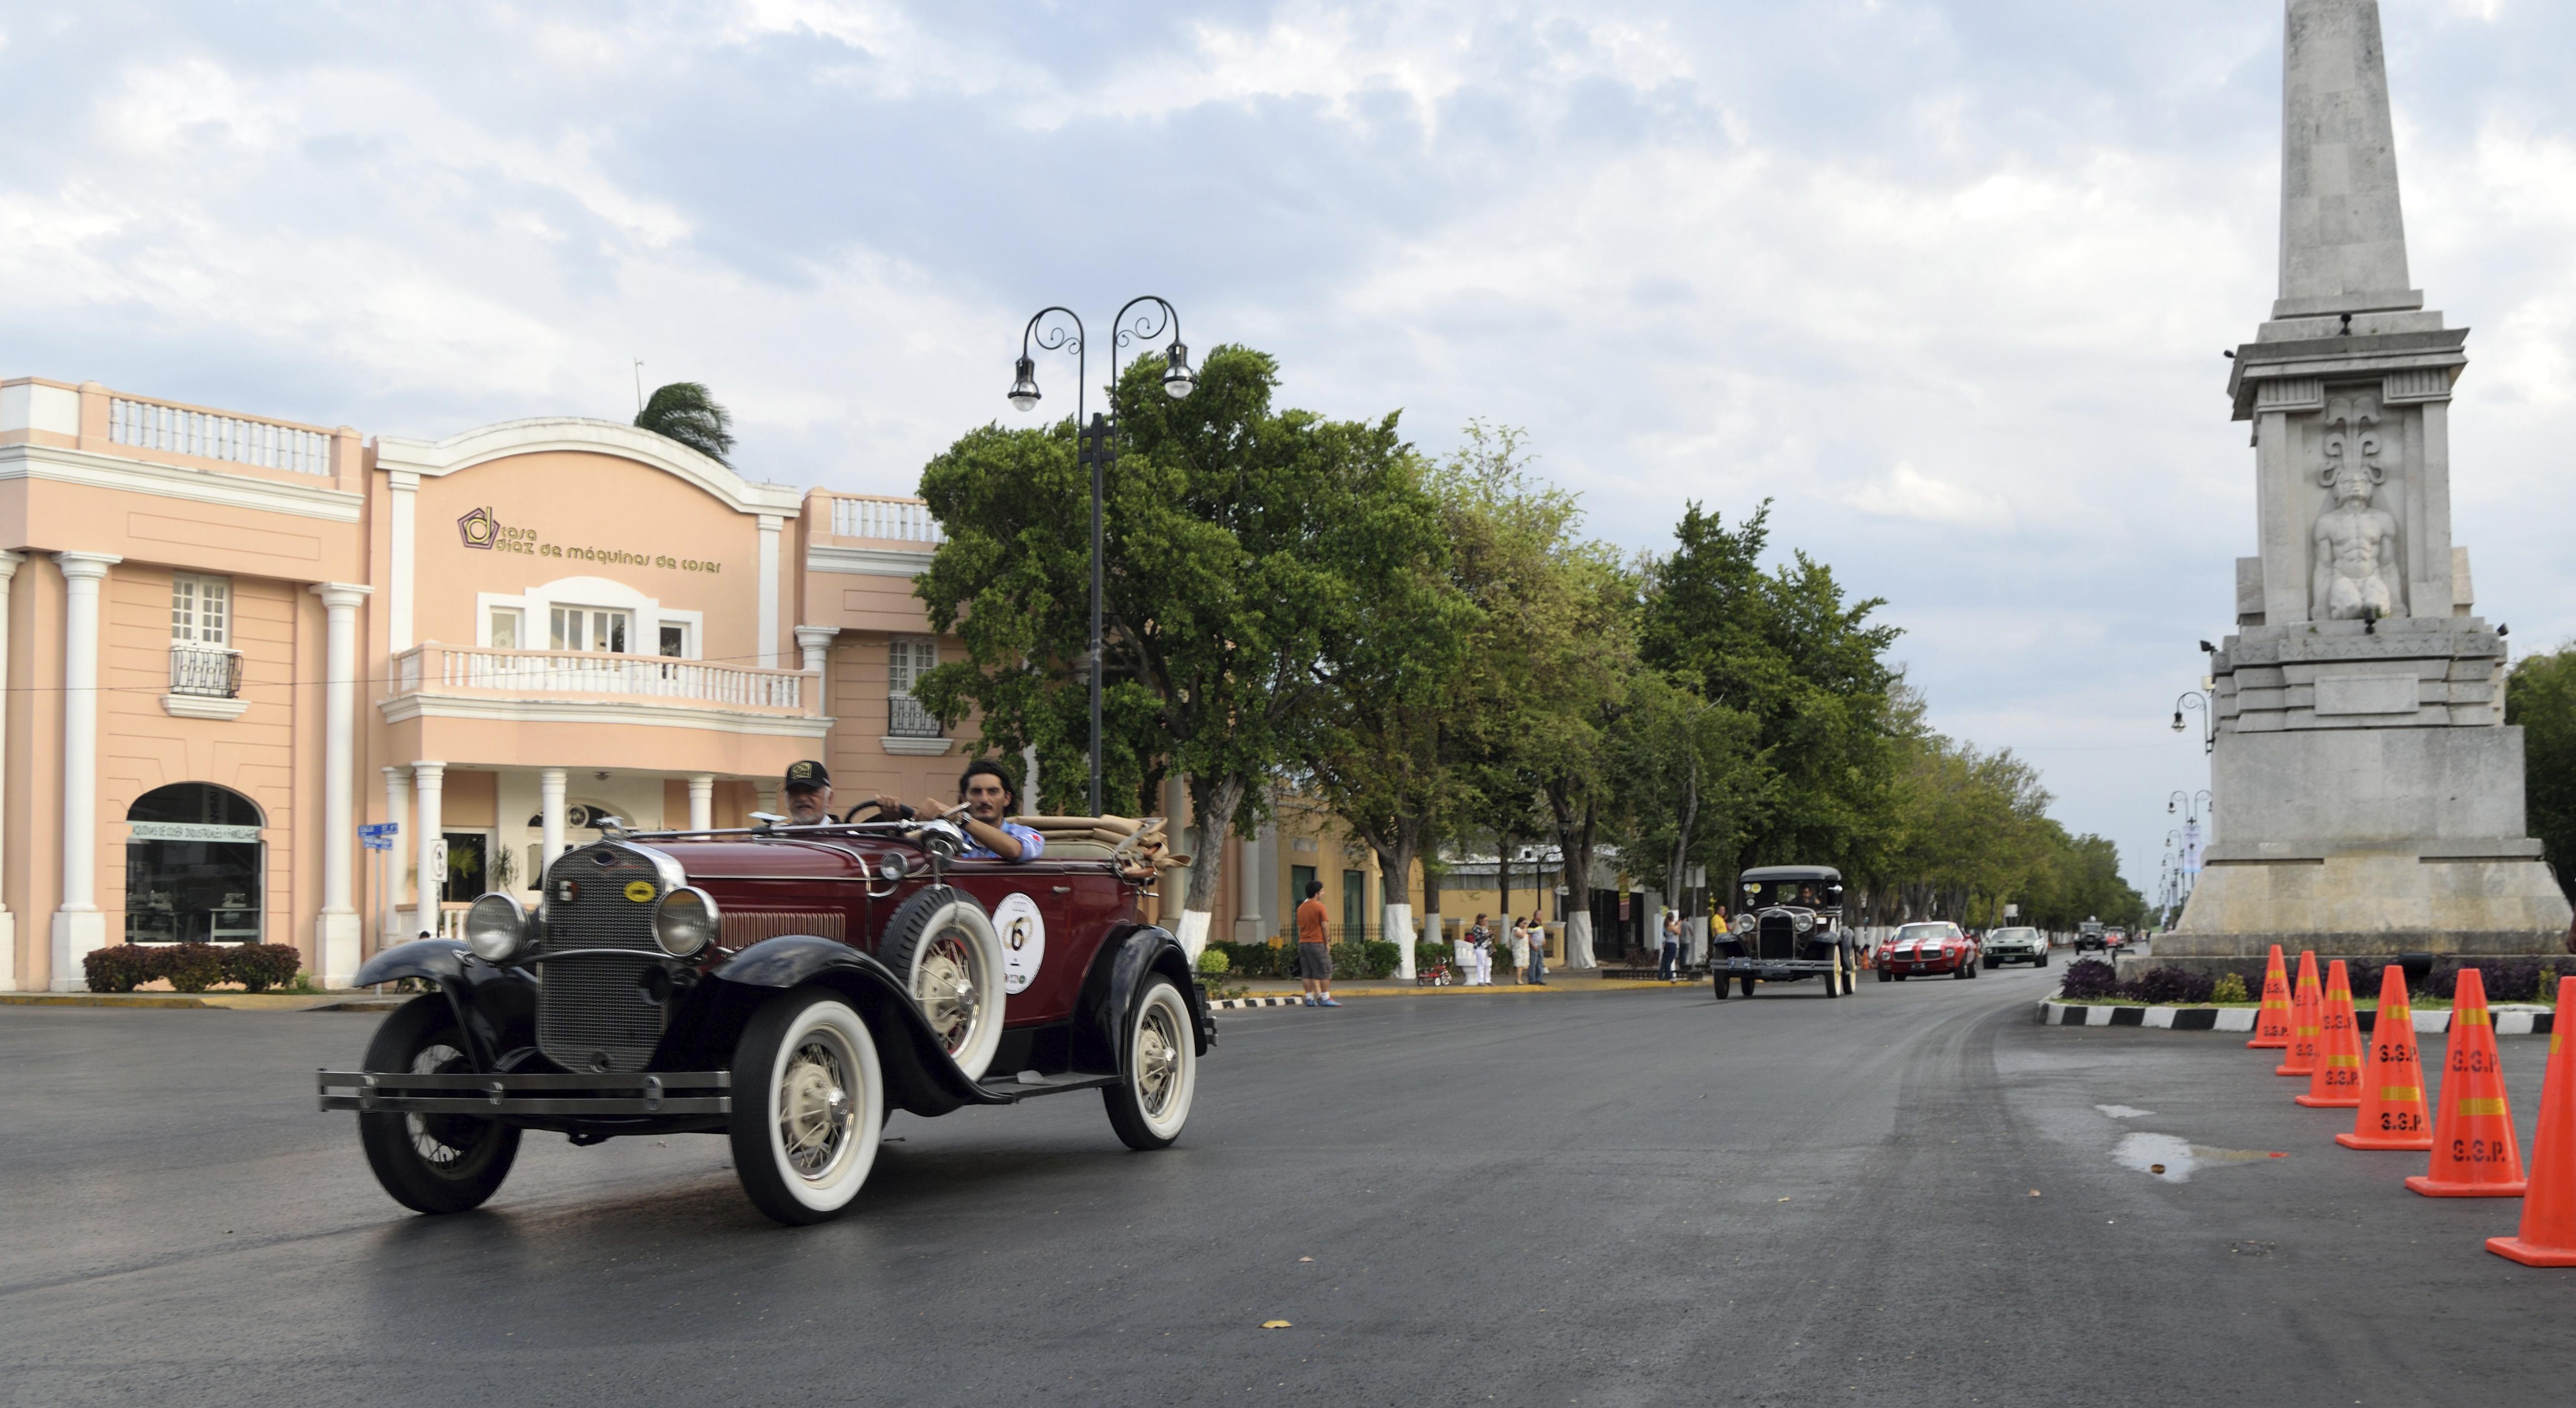 Foto Paseo de Montejo Merida Yucatán